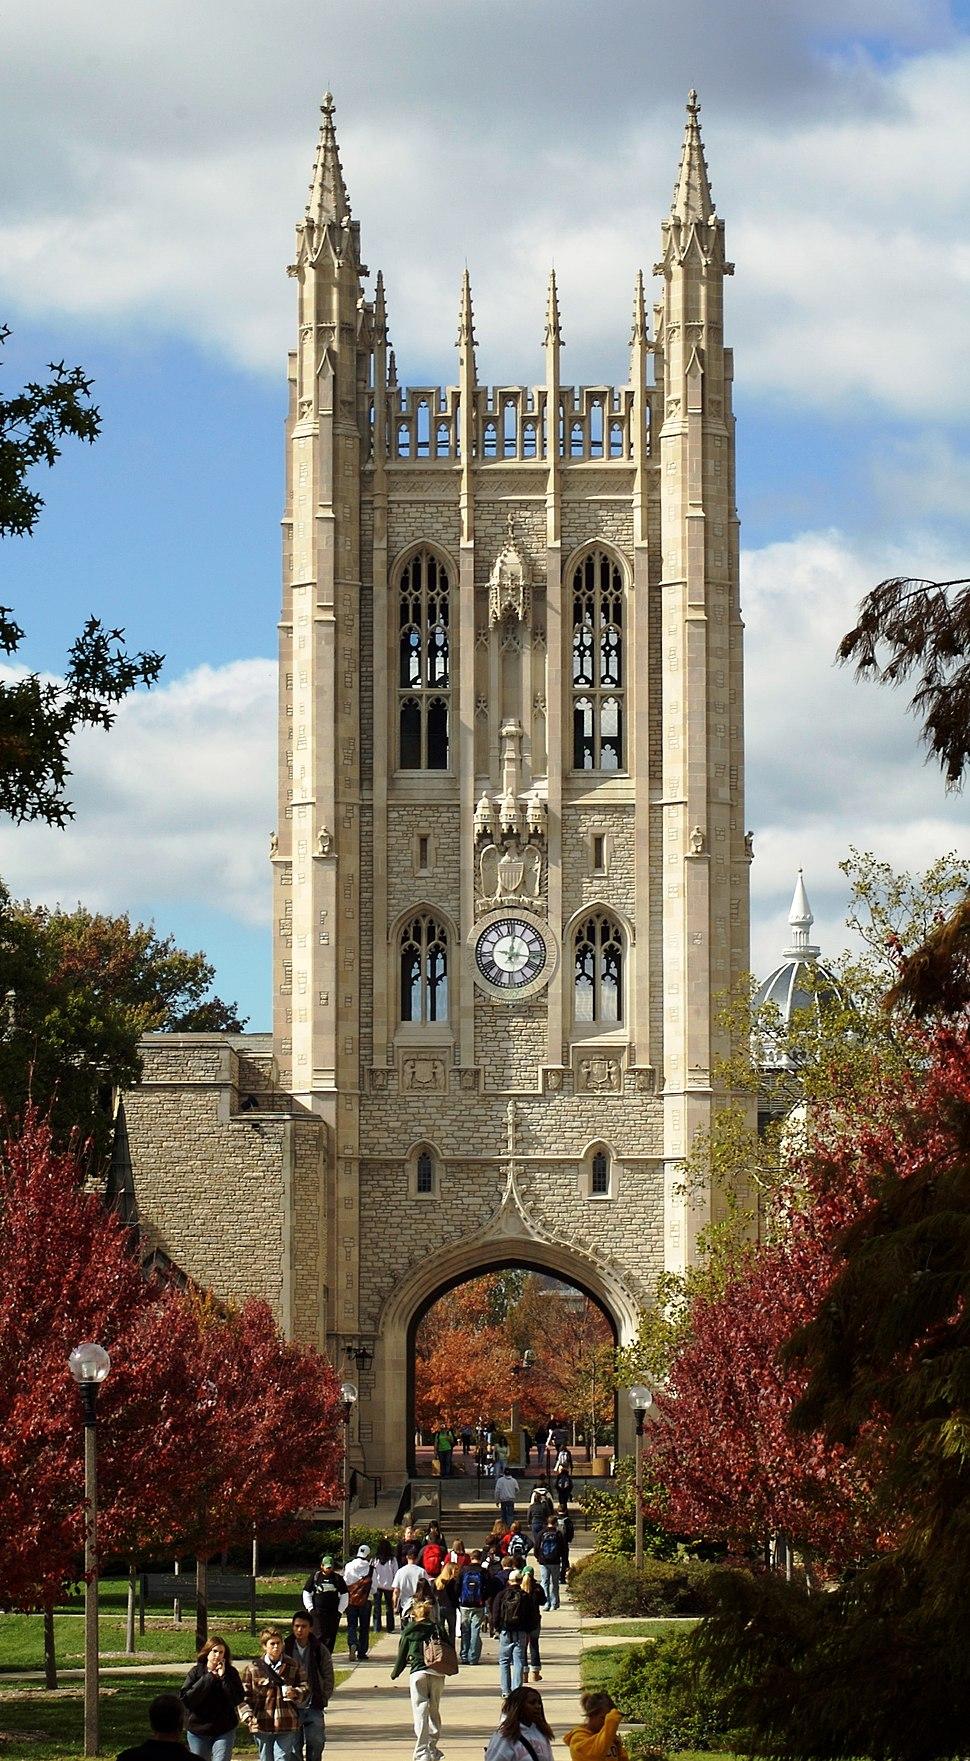 University of Missouri - Memorial Union